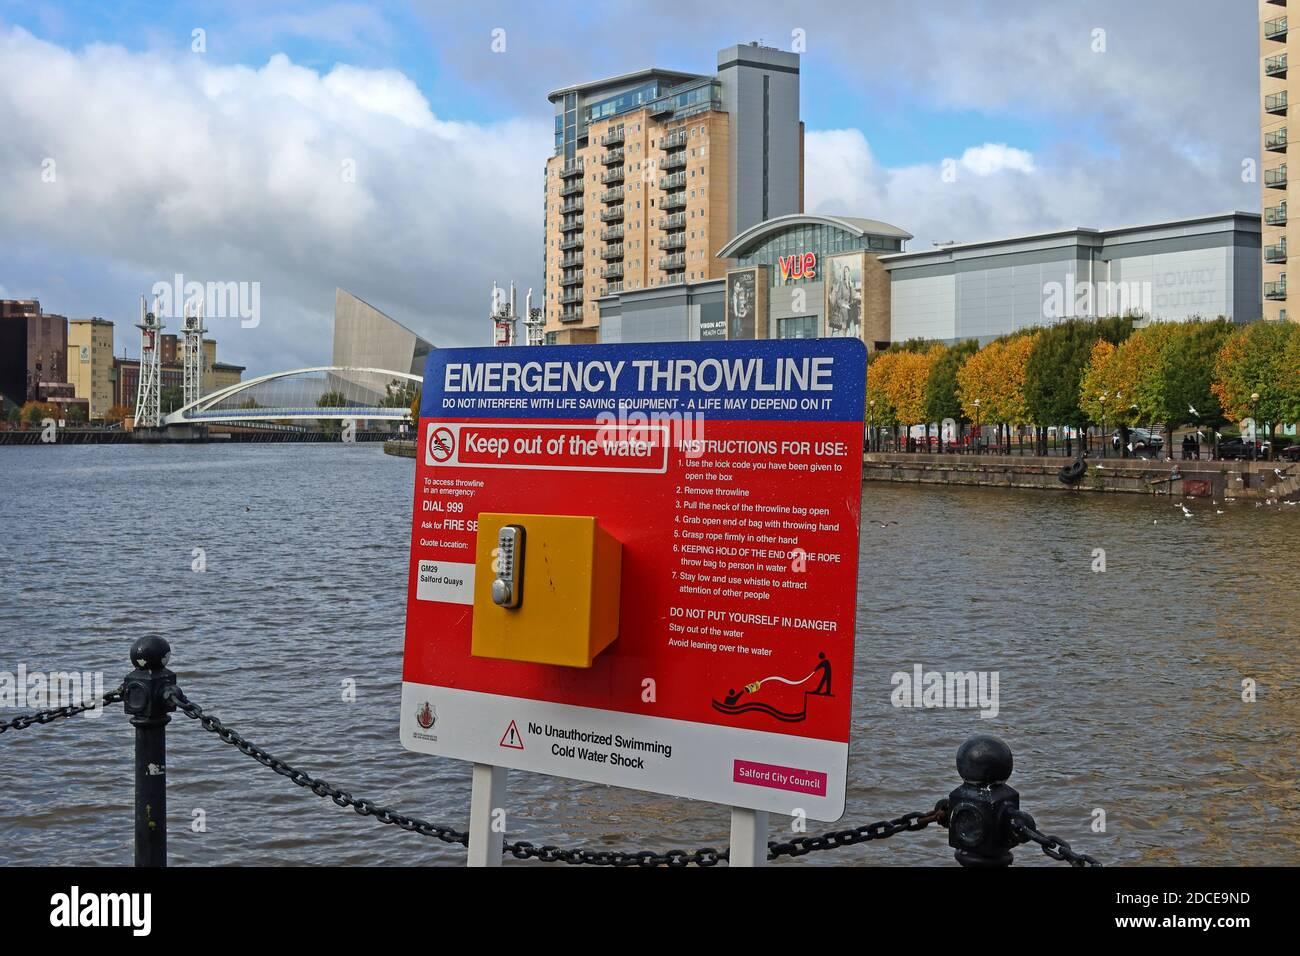 Hotpixuk,England,@Hotpixuk,UK,GB,Great Britain,GoTonySmith,water safety,safety,canal,M50,sign,lock,key,cold water shock,deep water,Emergency Throwline,Salford Quays,Salford,blocks,flats,housing,Vue,cinema